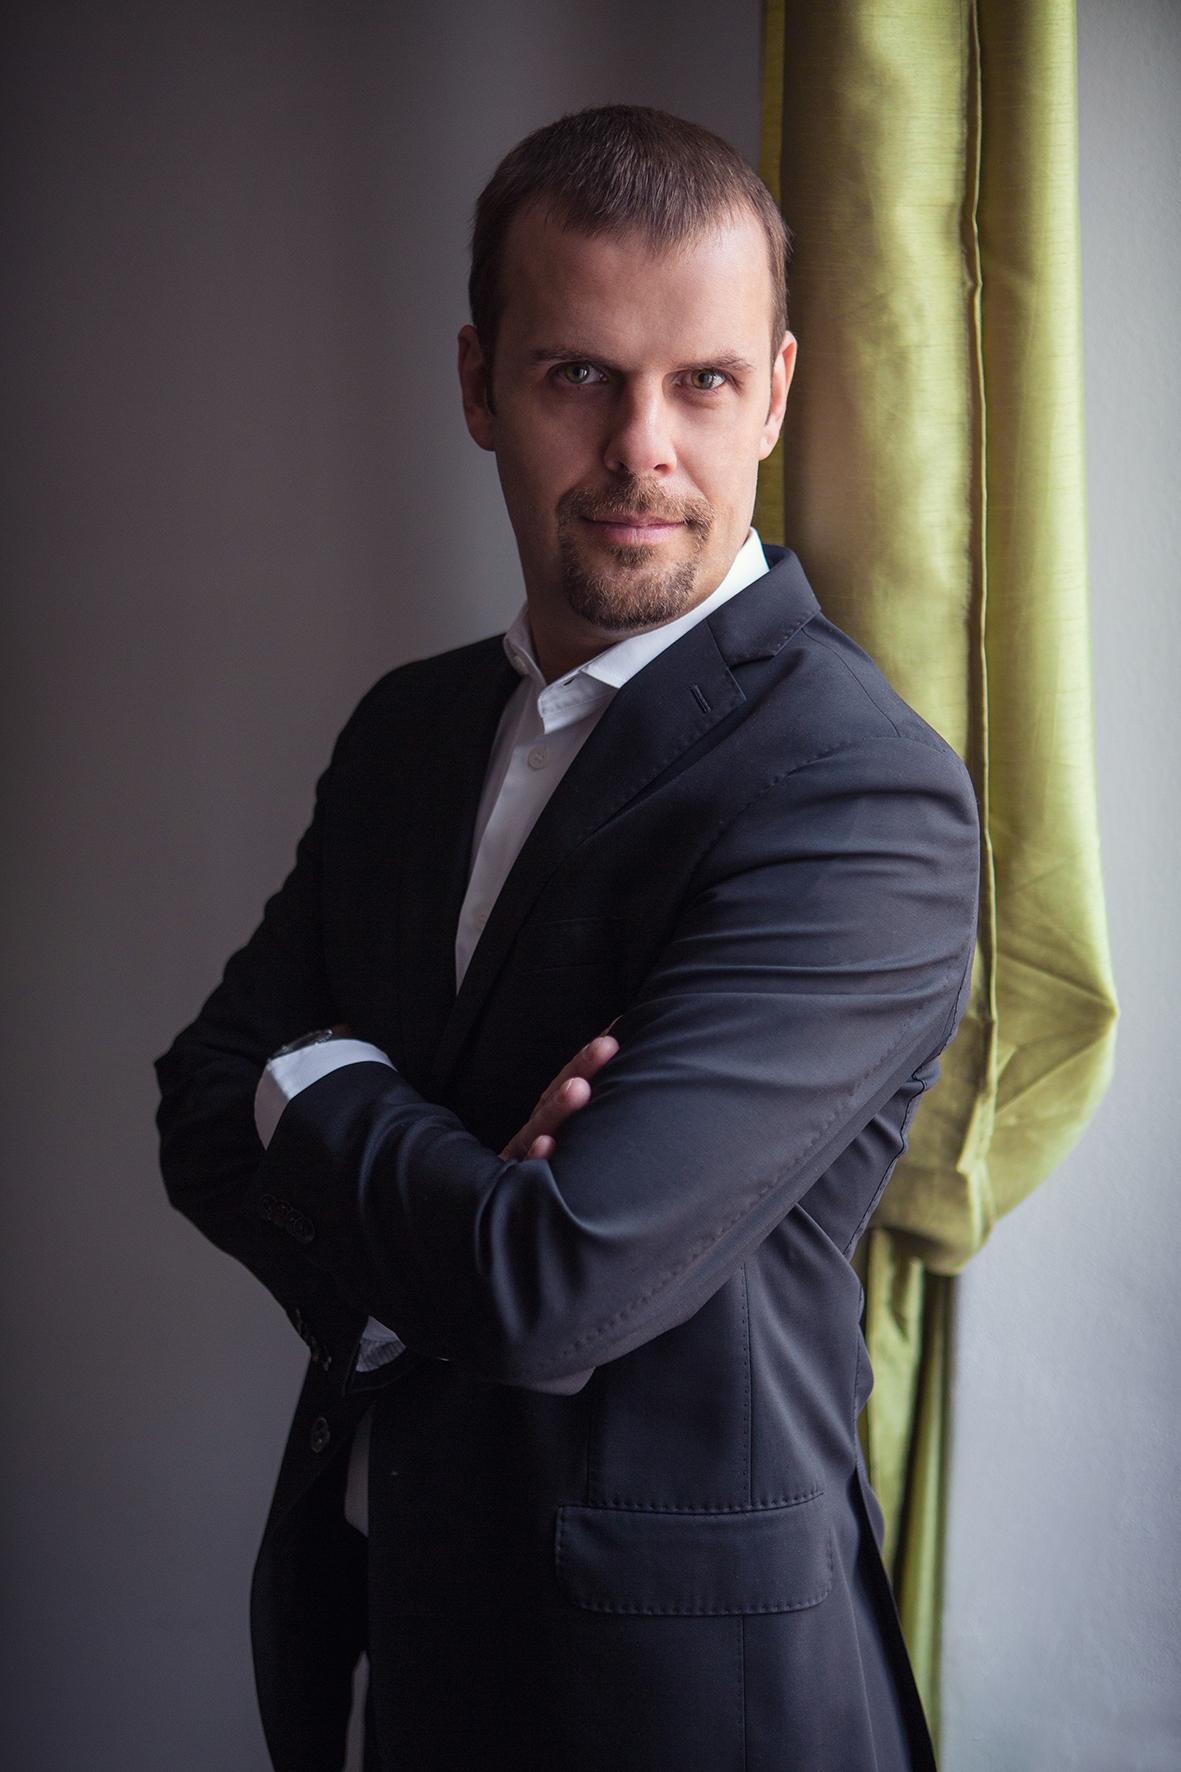 Moderator Ondra Pokorny 3